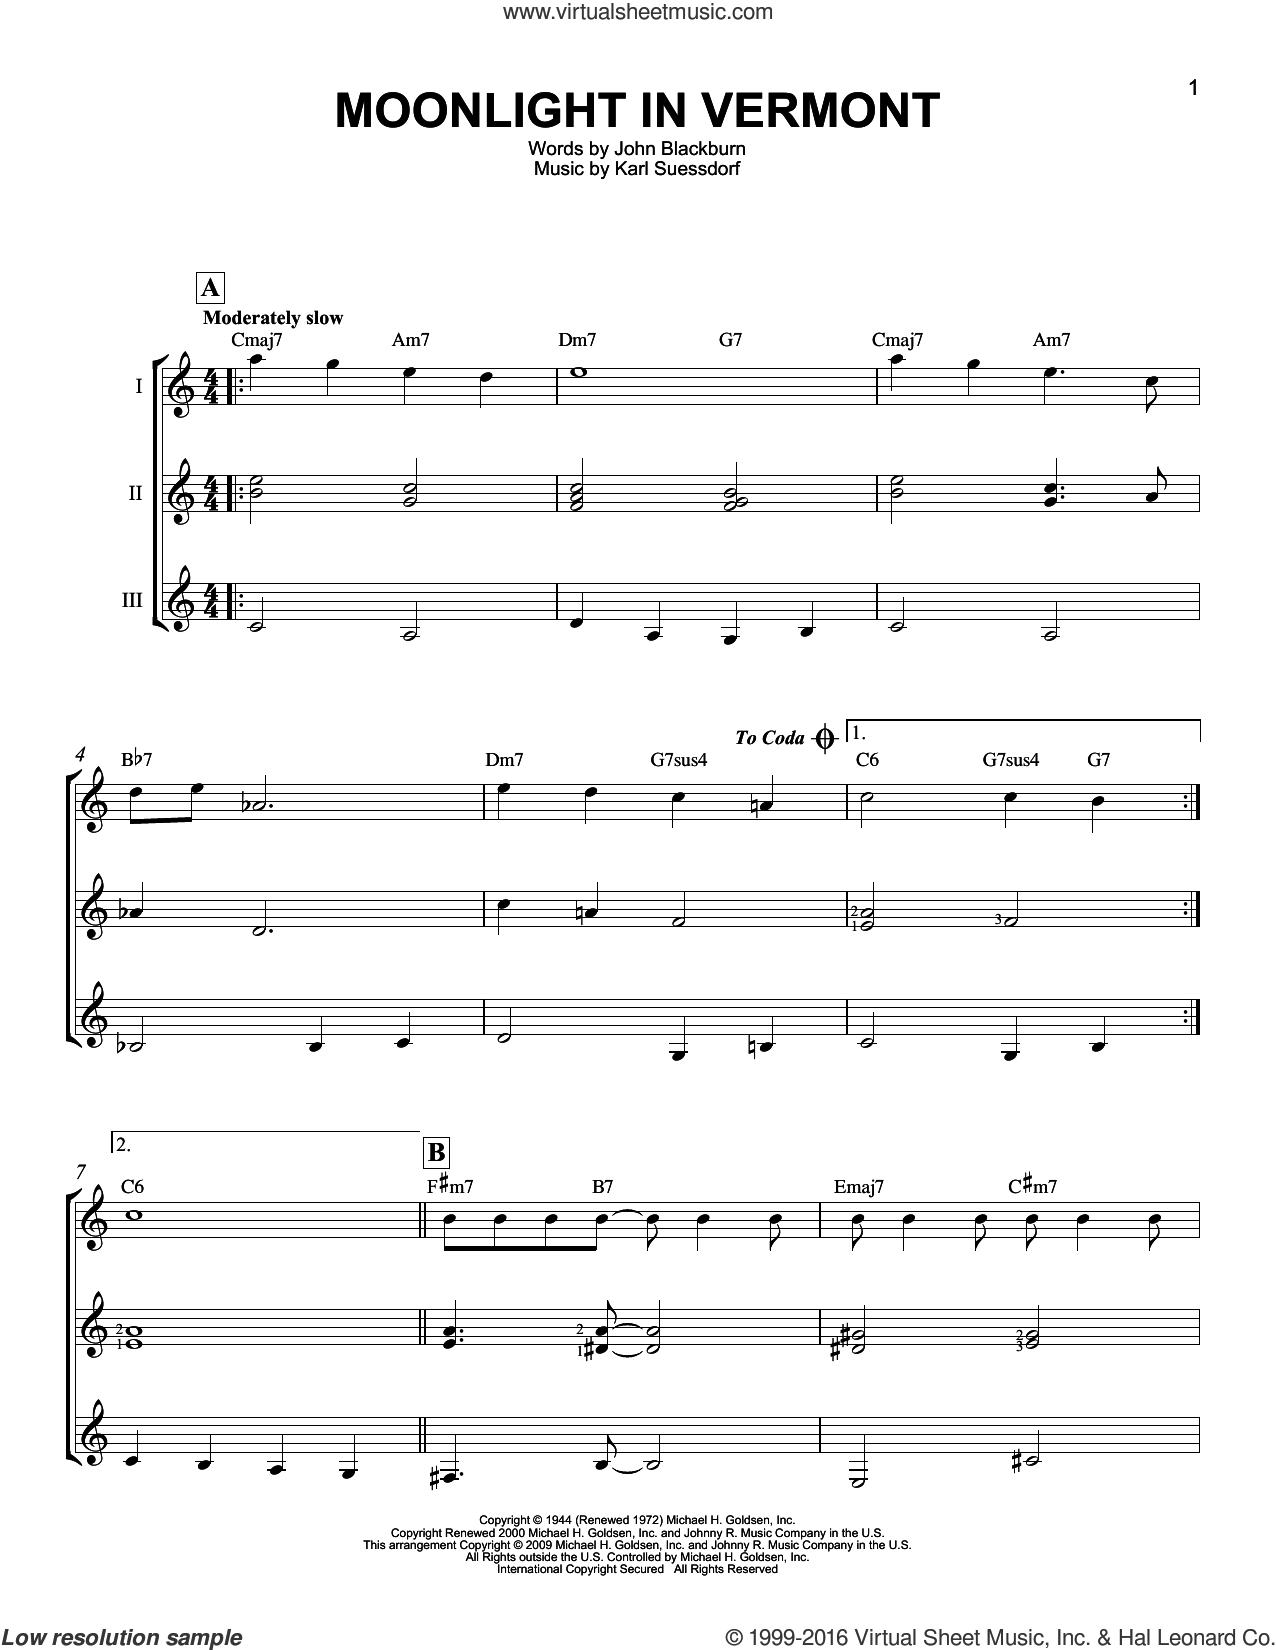 Moonlight In Vermont sheet music for guitar ensemble by Karl Suessdorf and John Blackburn, intermediate skill level